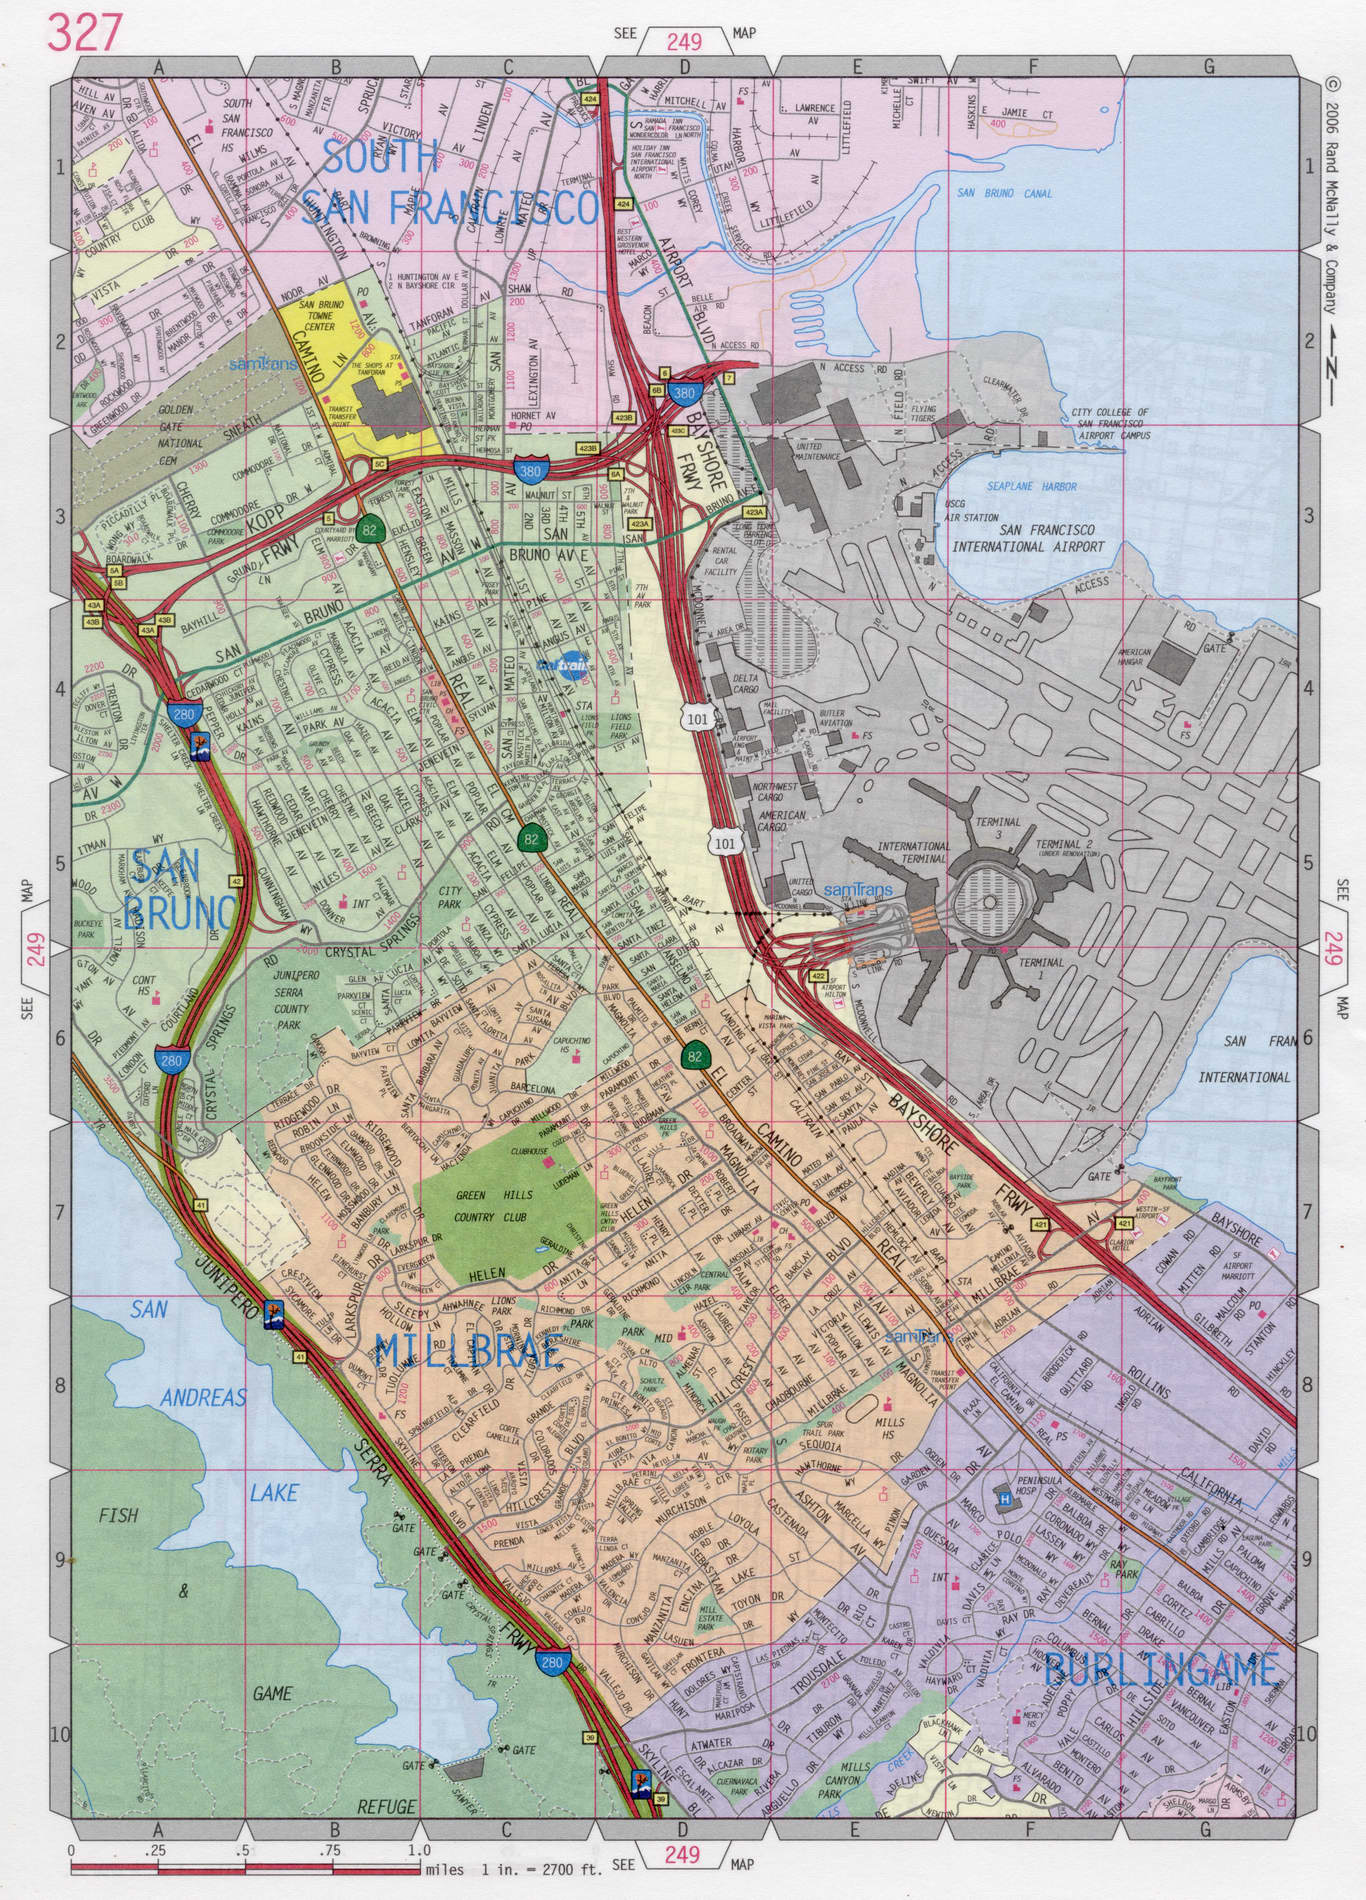 Image of: Map Of Burlingame City California Us Free Large Detailed Road Map Atlas Usa